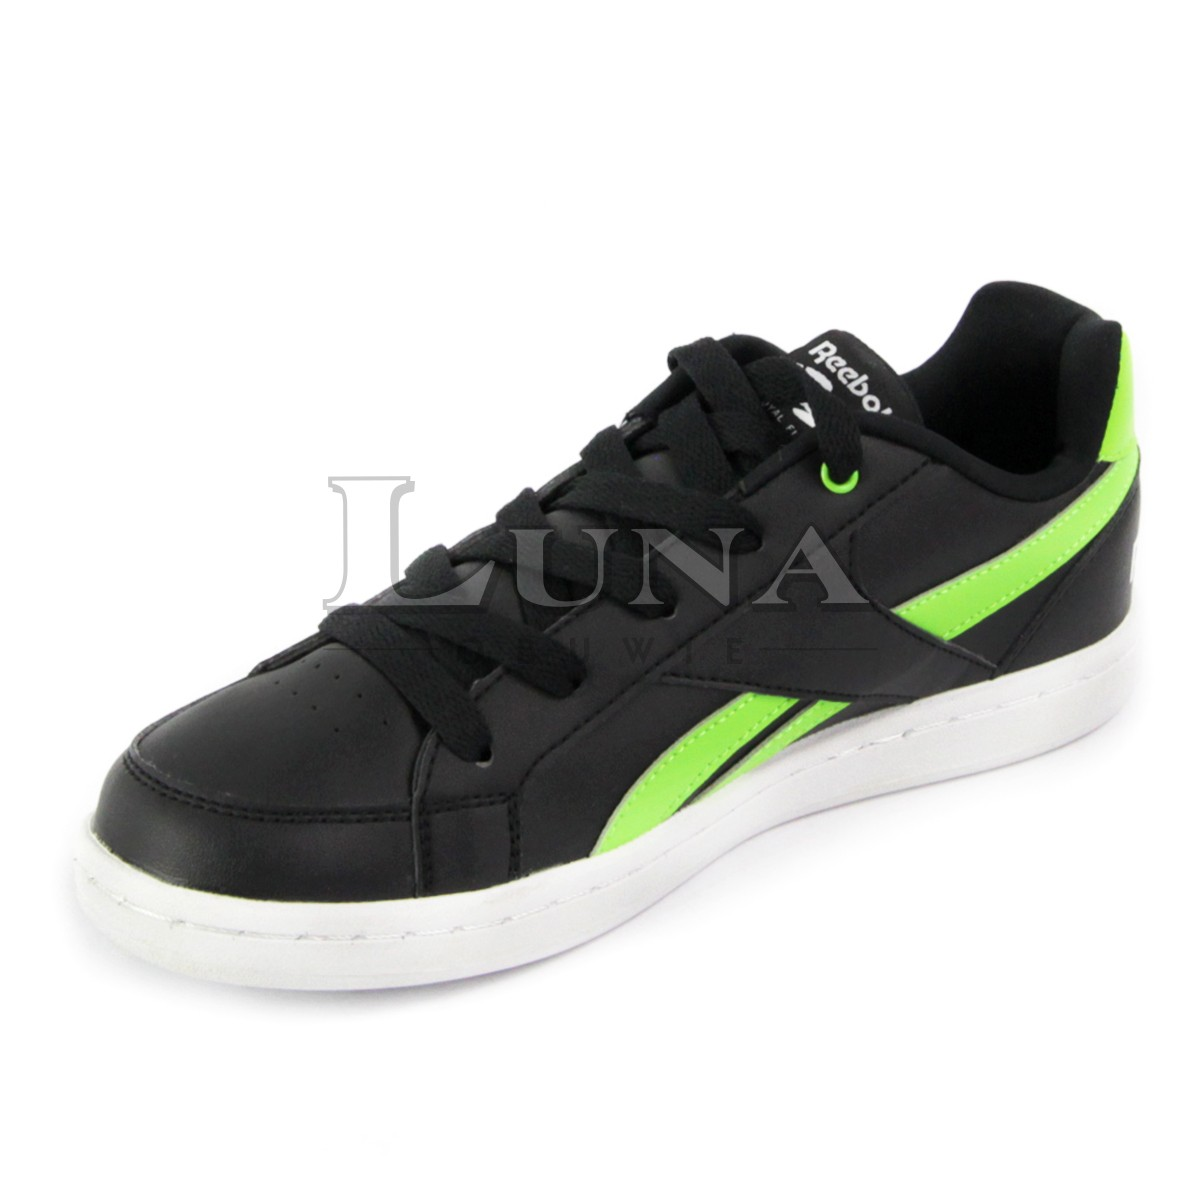 0e035ff3 Obuwie sportowe damskie REEBOK ROYAL PRIME AR0796 BLACK GREEN WHITE ...